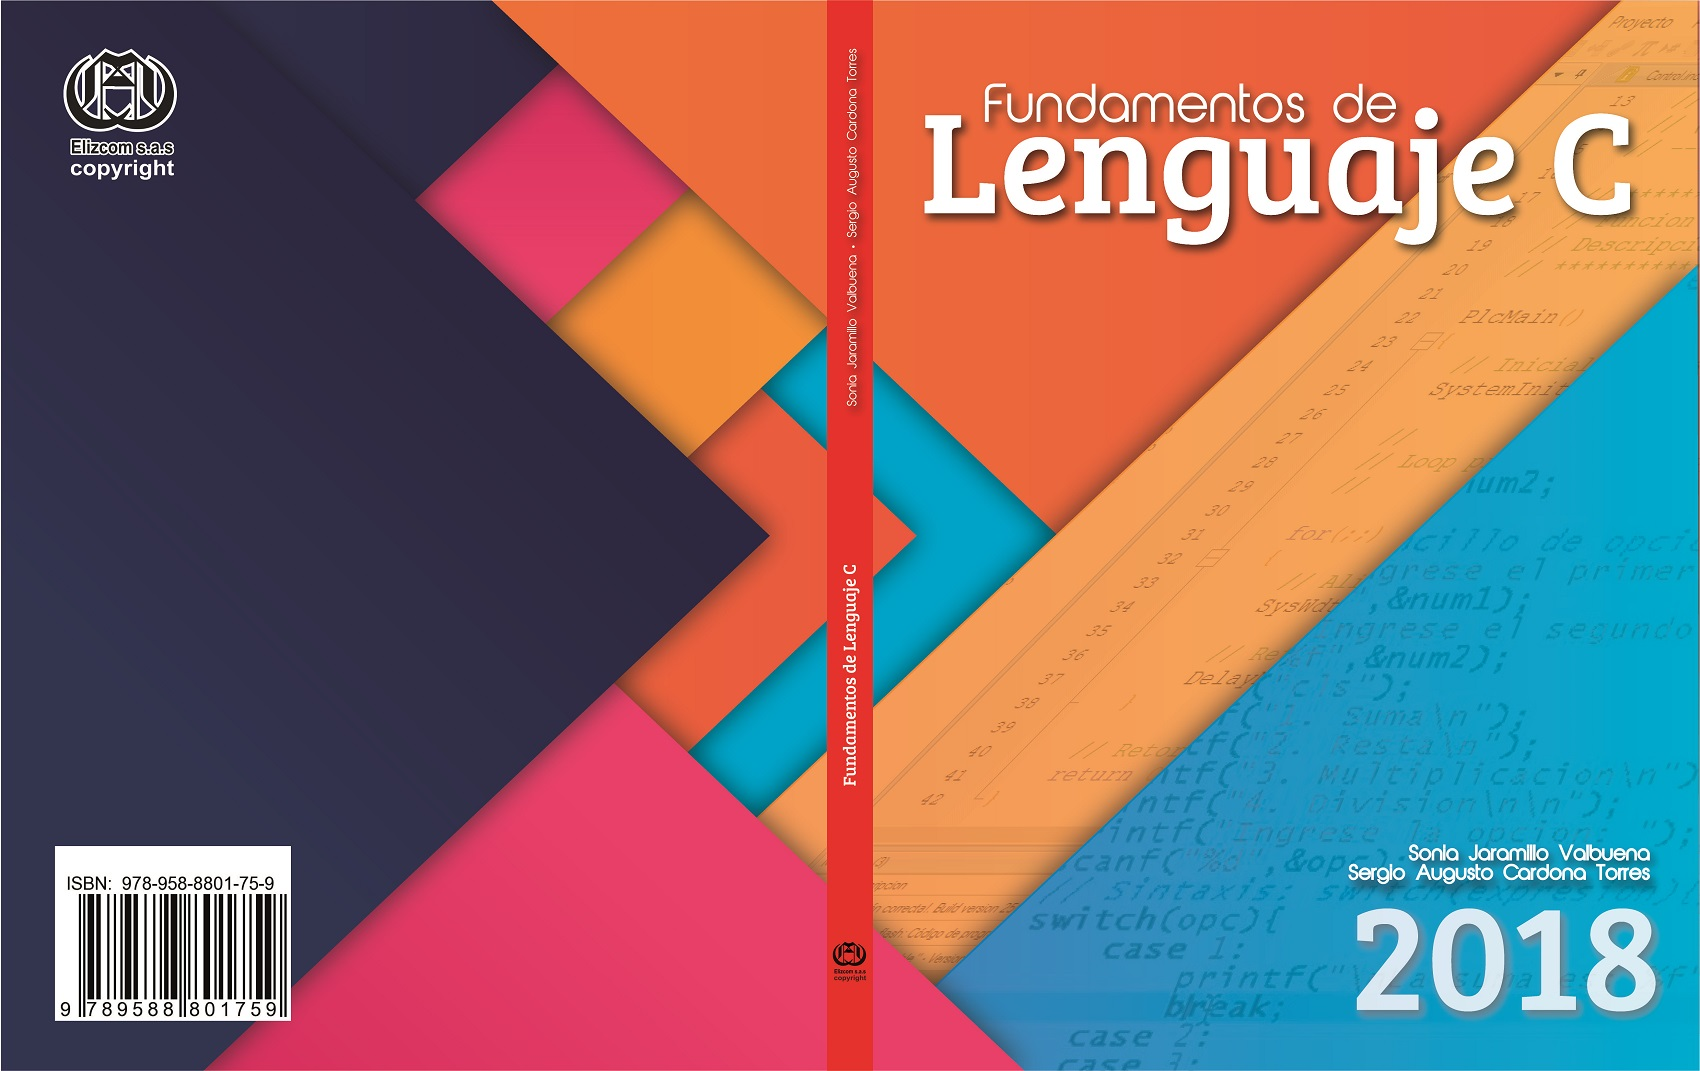 fundamentos de lenguaje c x5 EDITORIAL